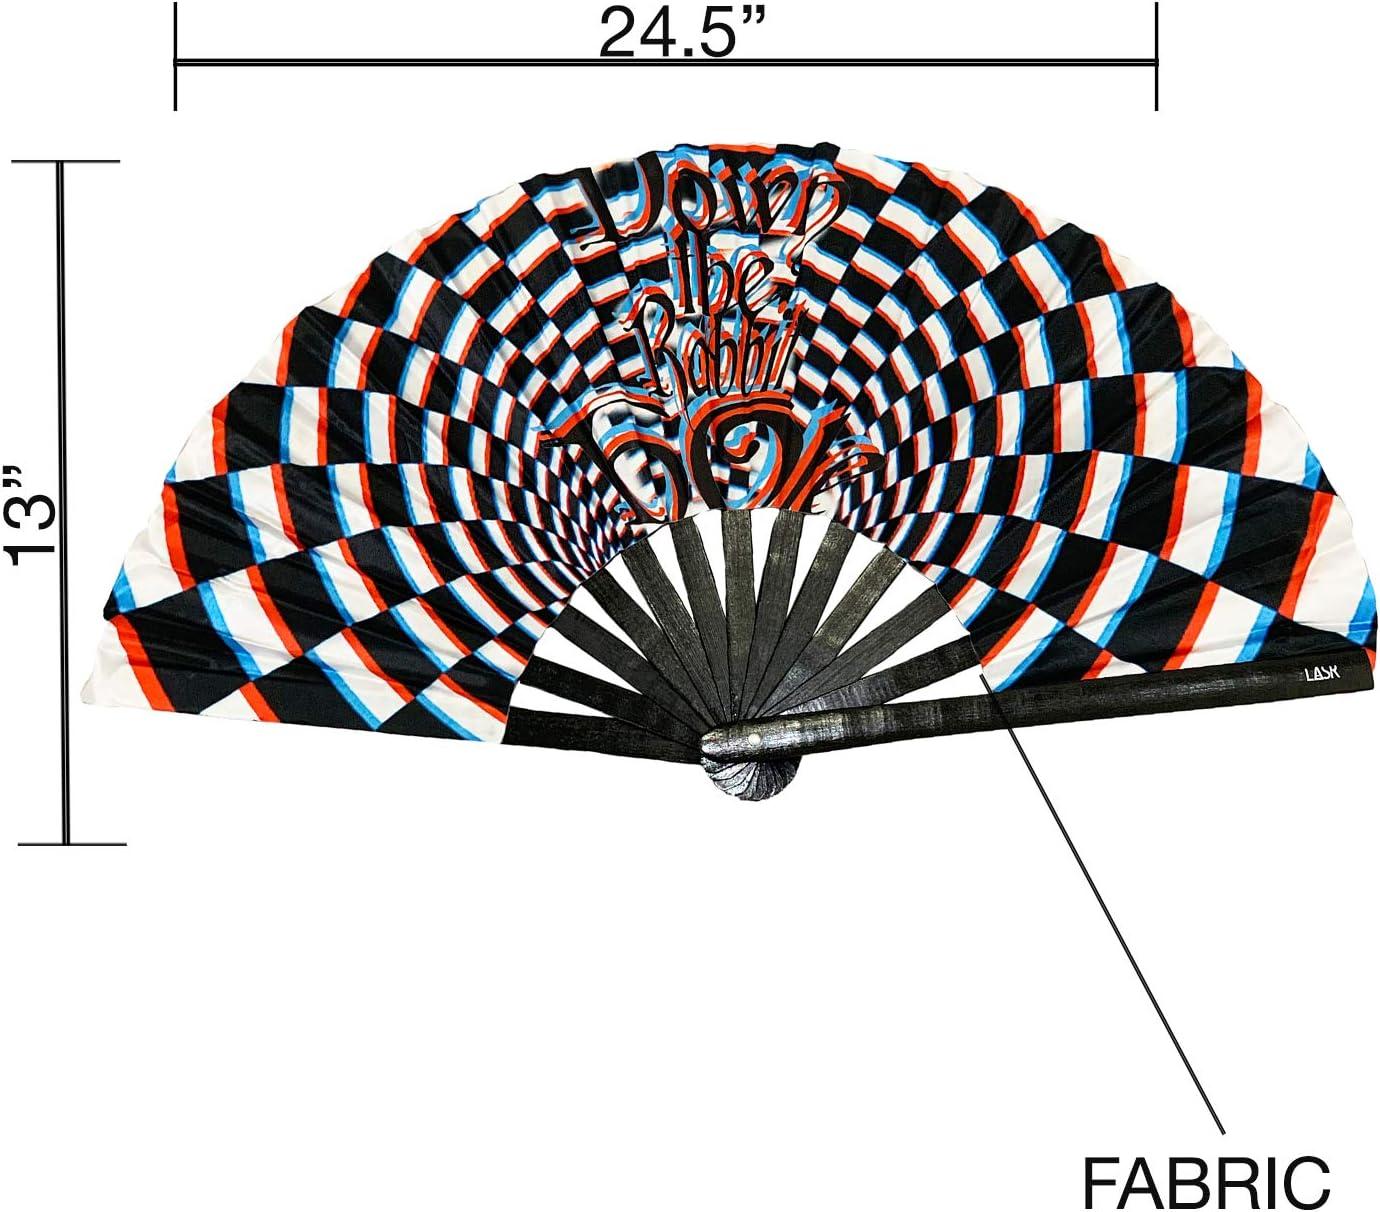 Exclusive LASR Psychedelic Rabbit Festival Hand Fan Multi Rave Gear